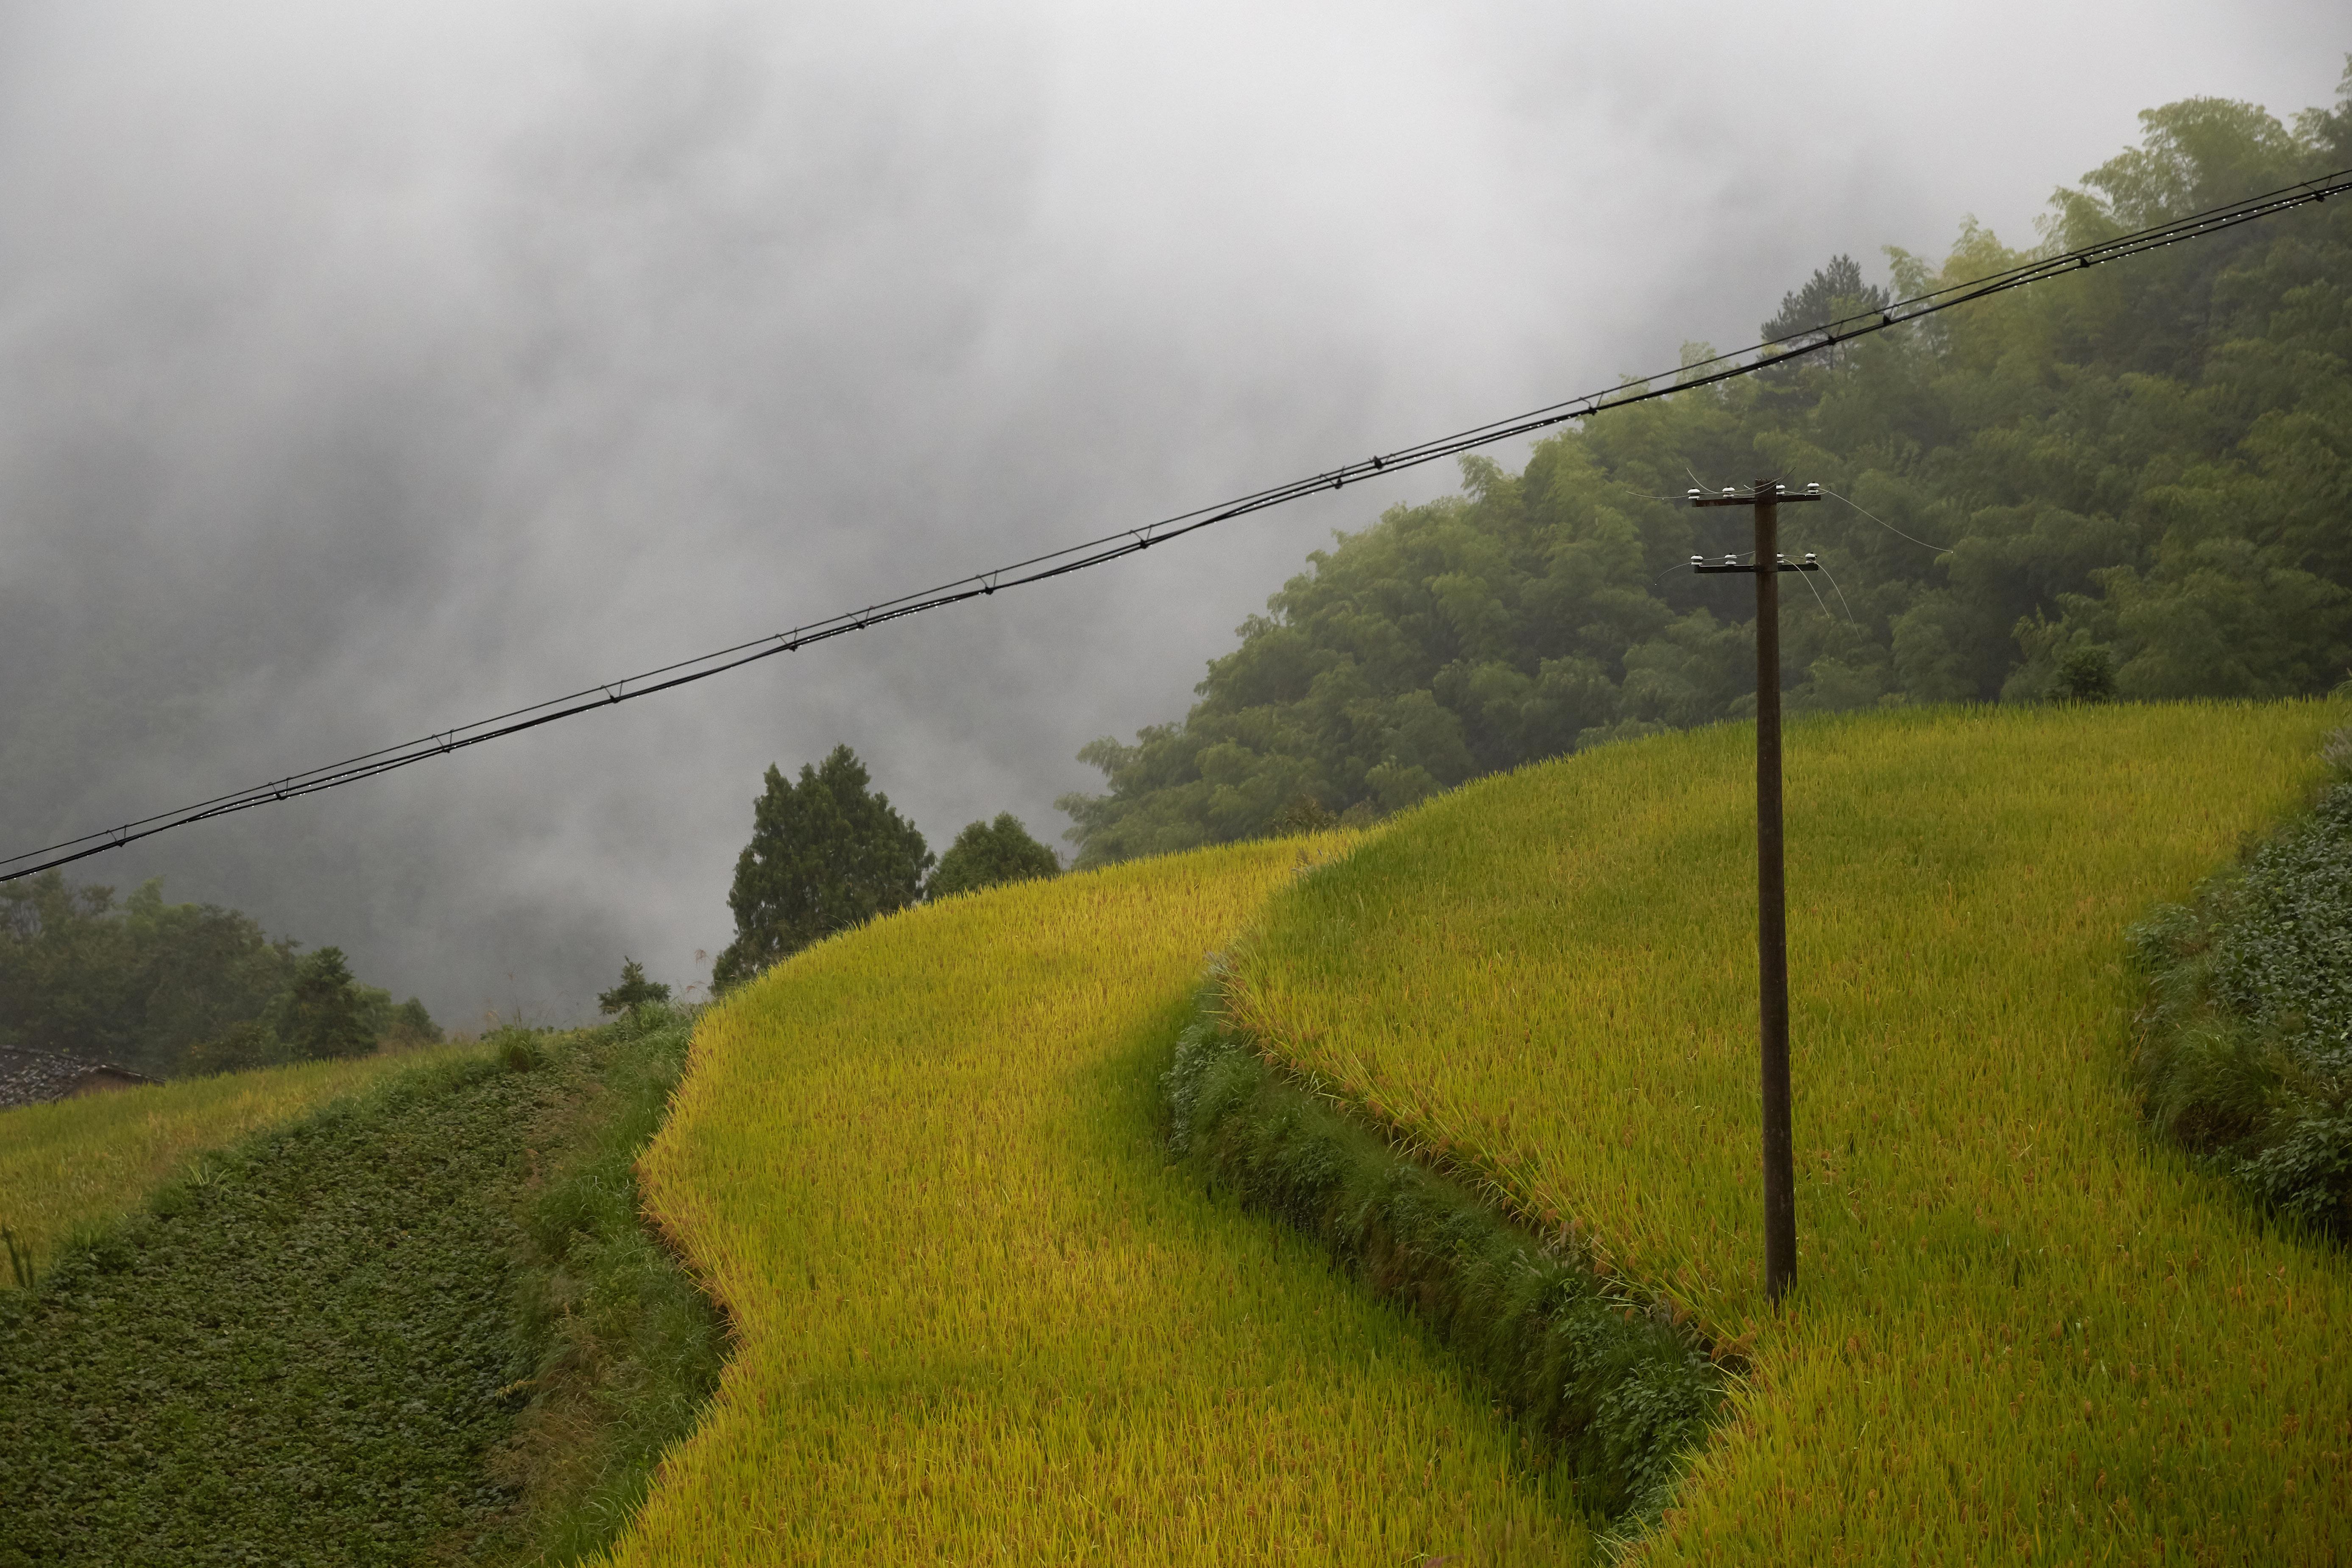 Gongyu, Zhejiang Province, China